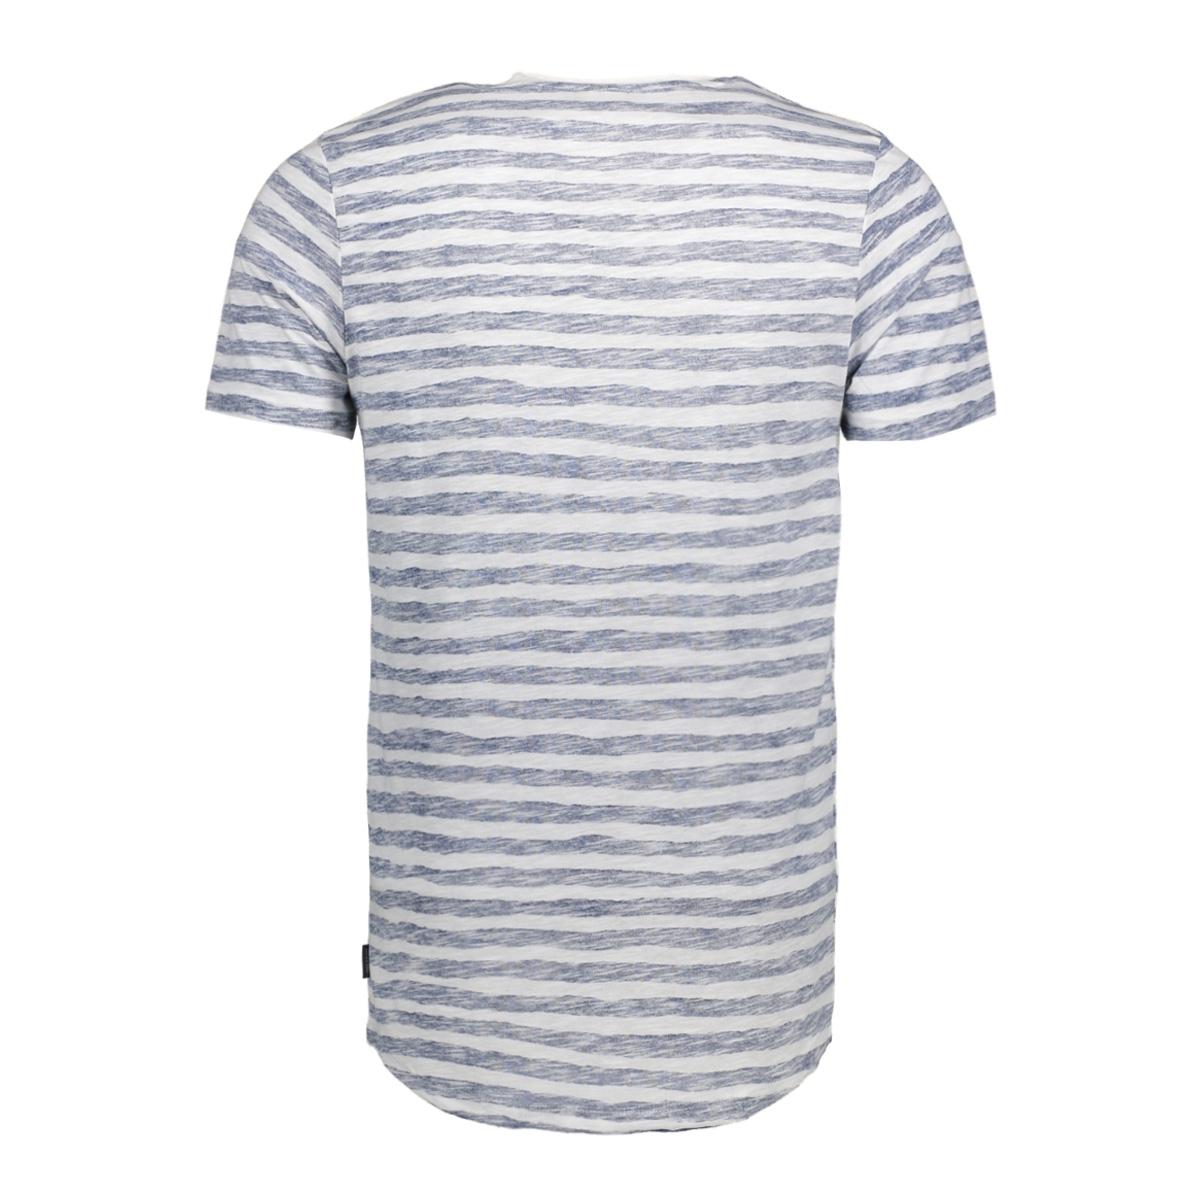 jorreverse tee ss crew neck 12121140 jack & jones t-shirt ensign blue